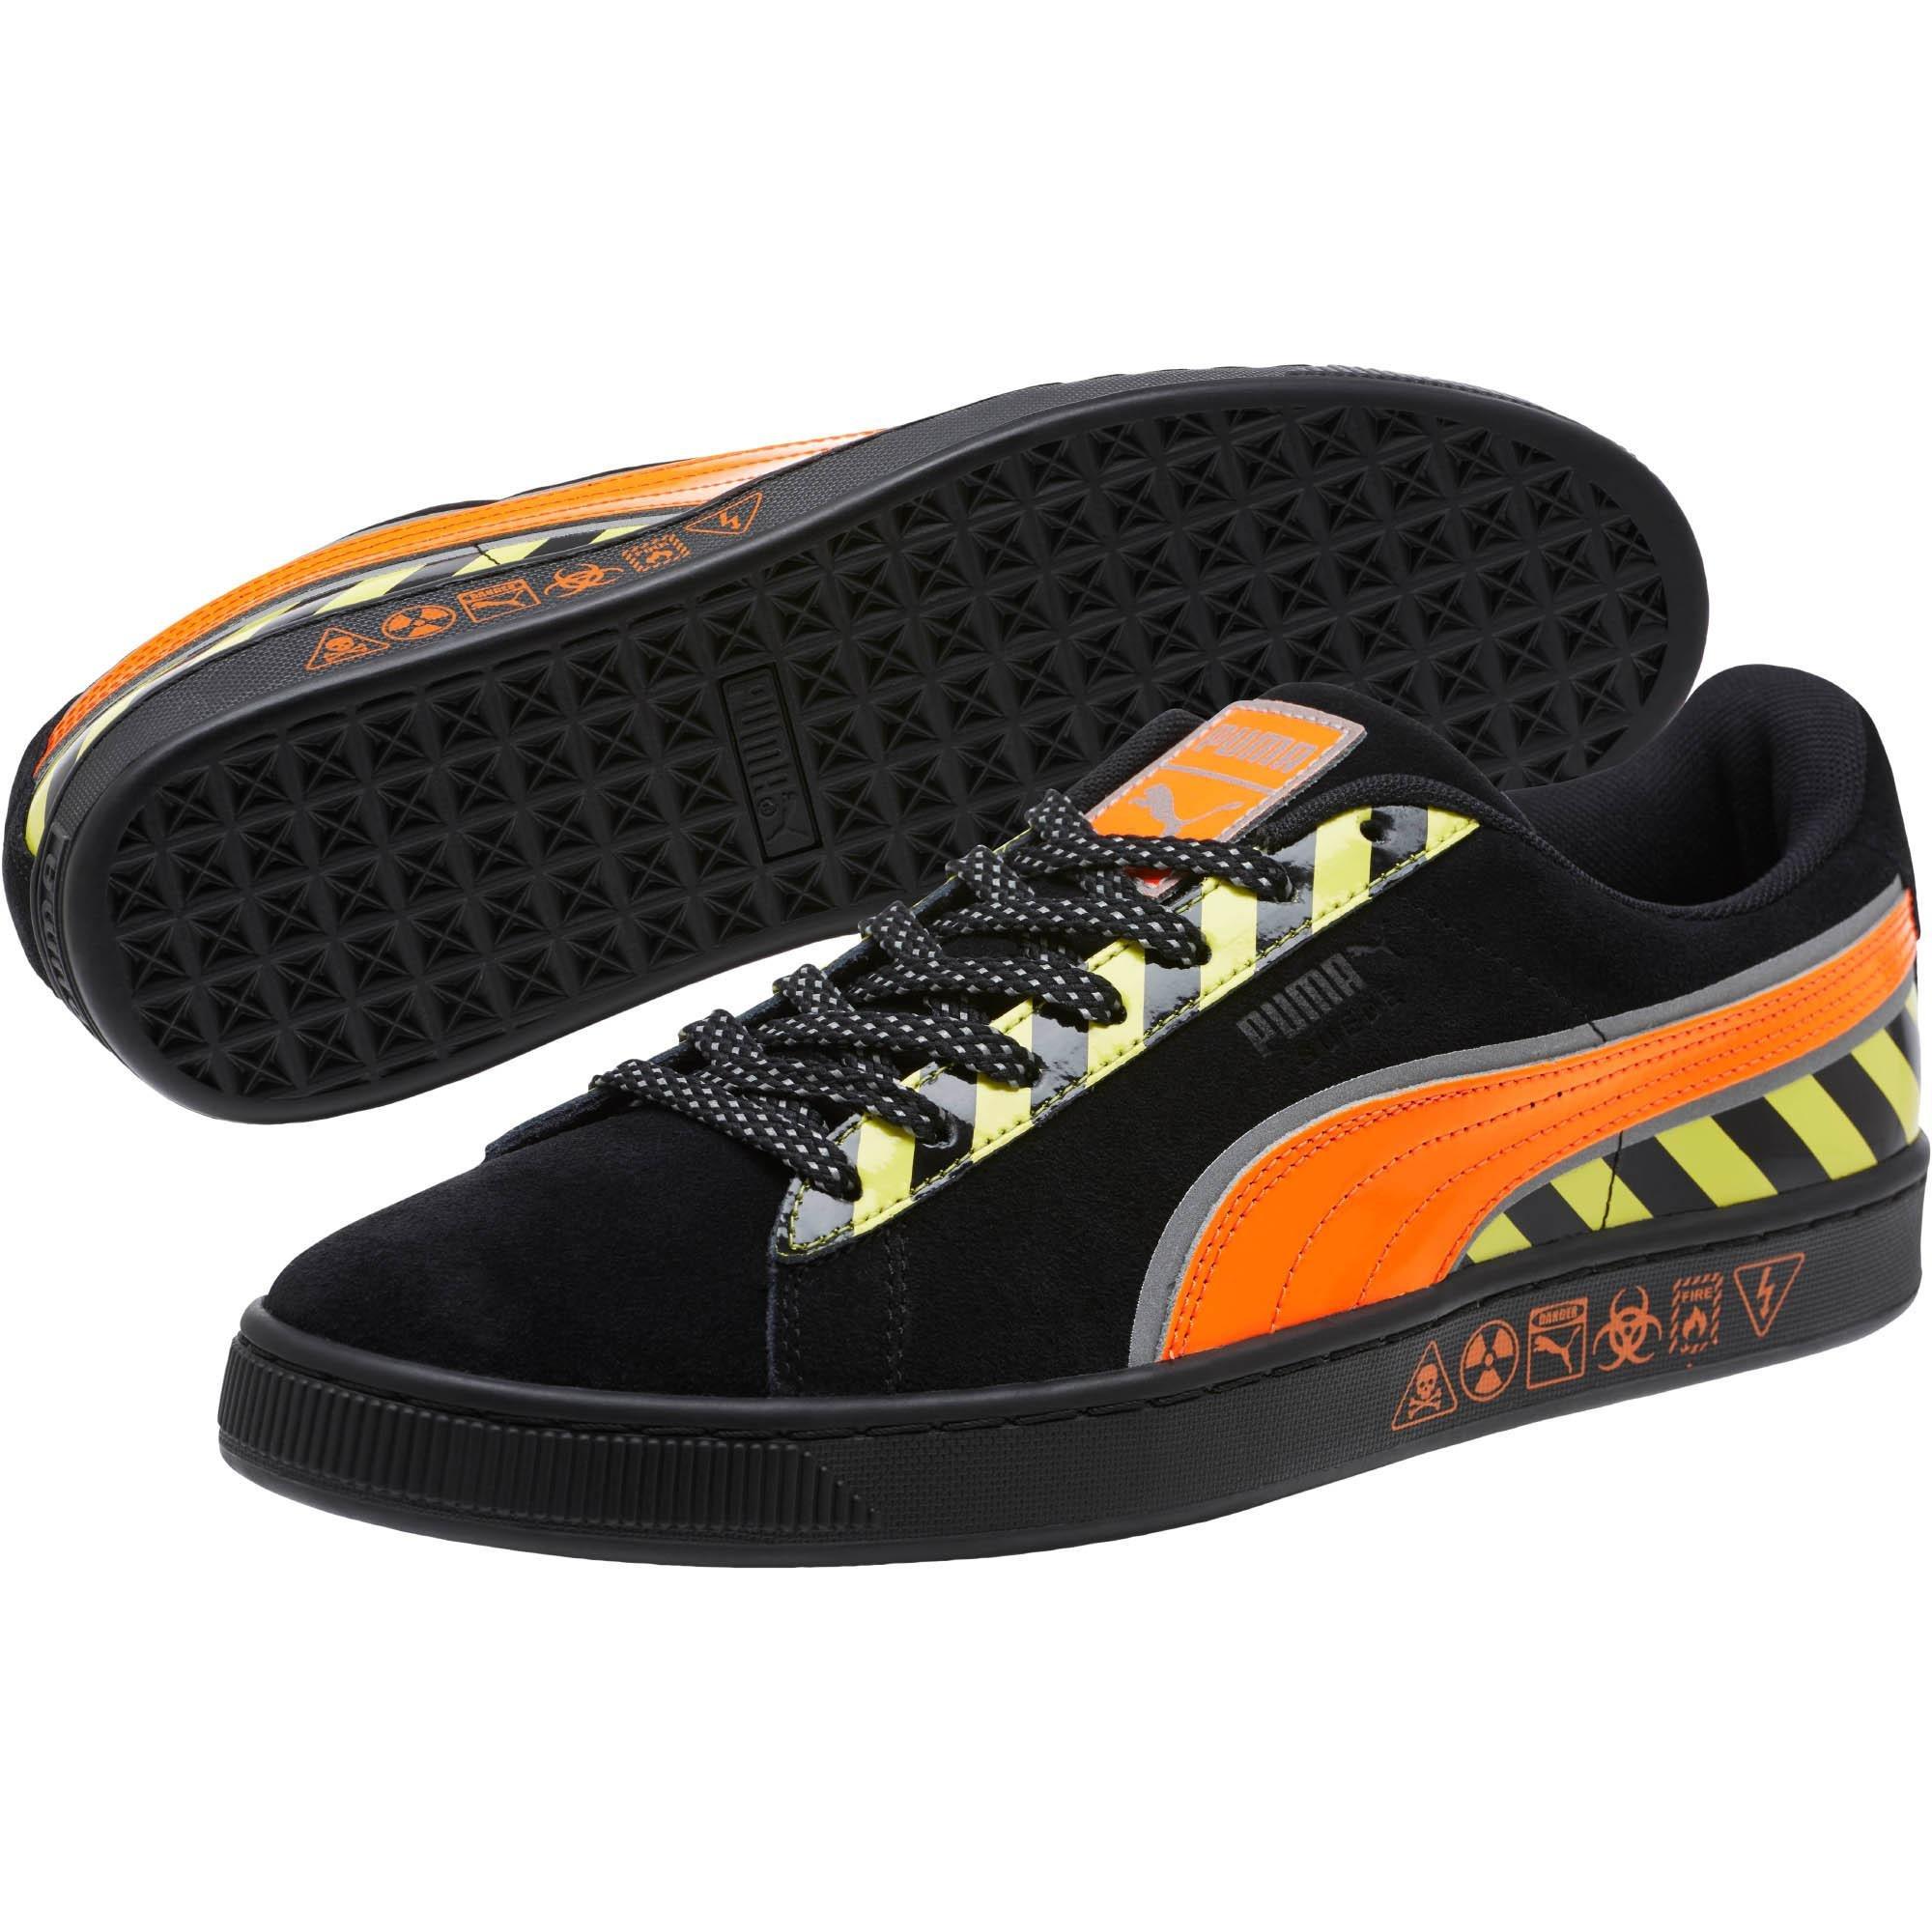 Lyst - PUMA Suede Hazard Sneakers in Black for Men 5778617eedd